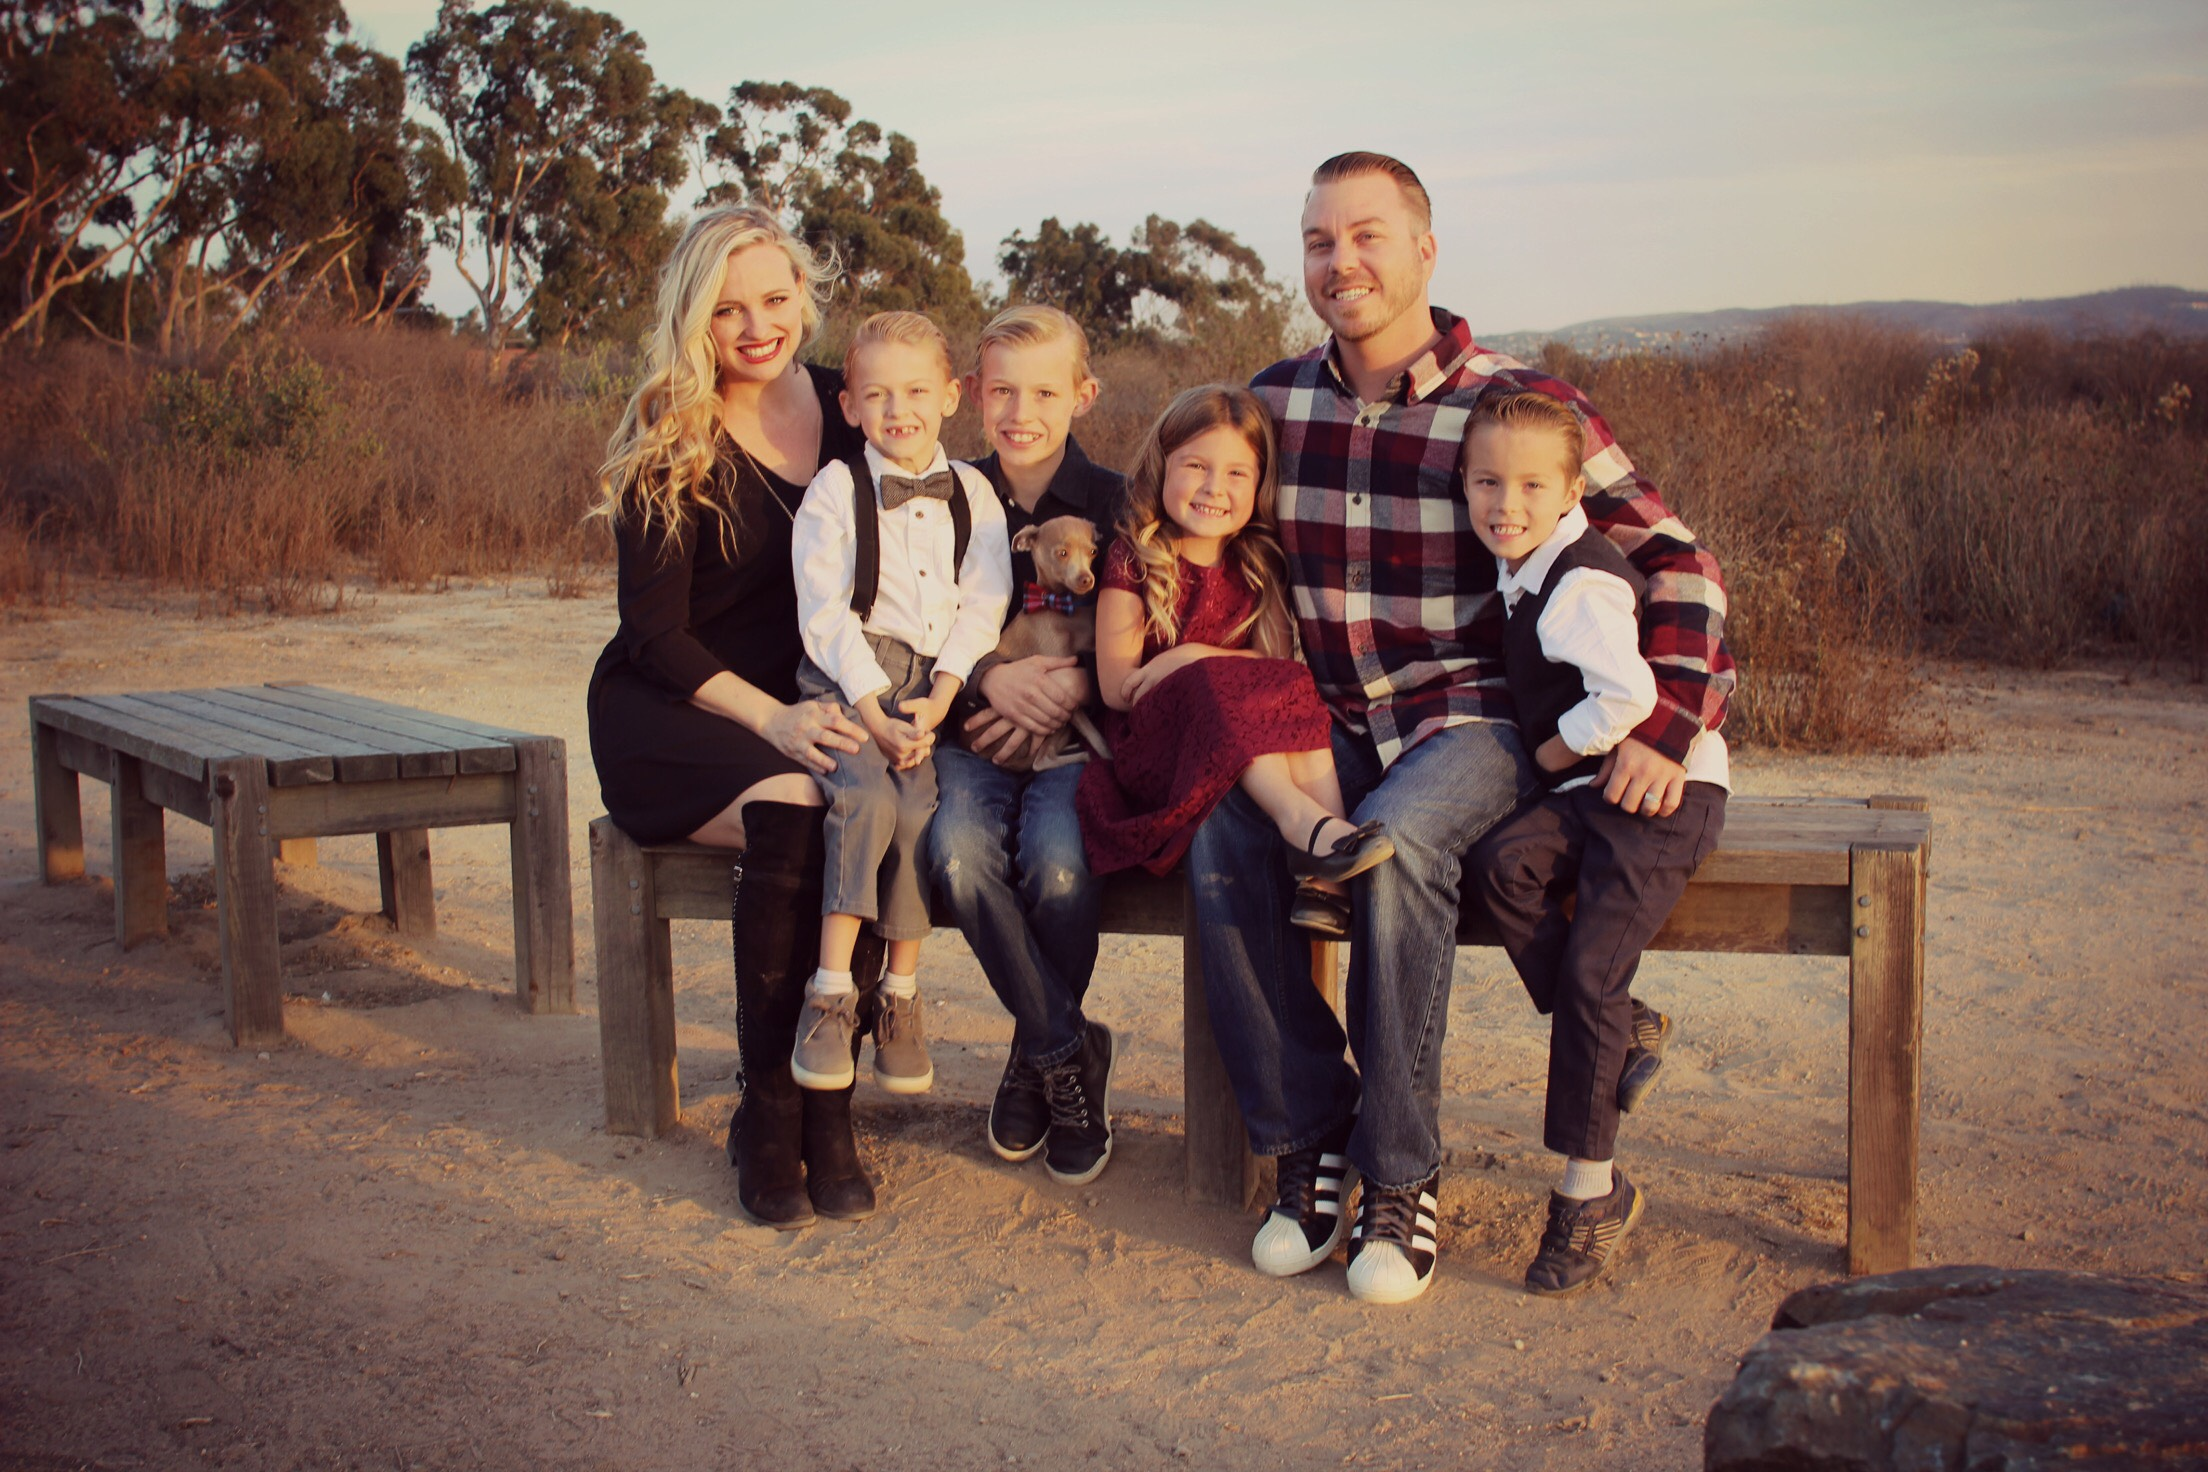 Waylon with his Family